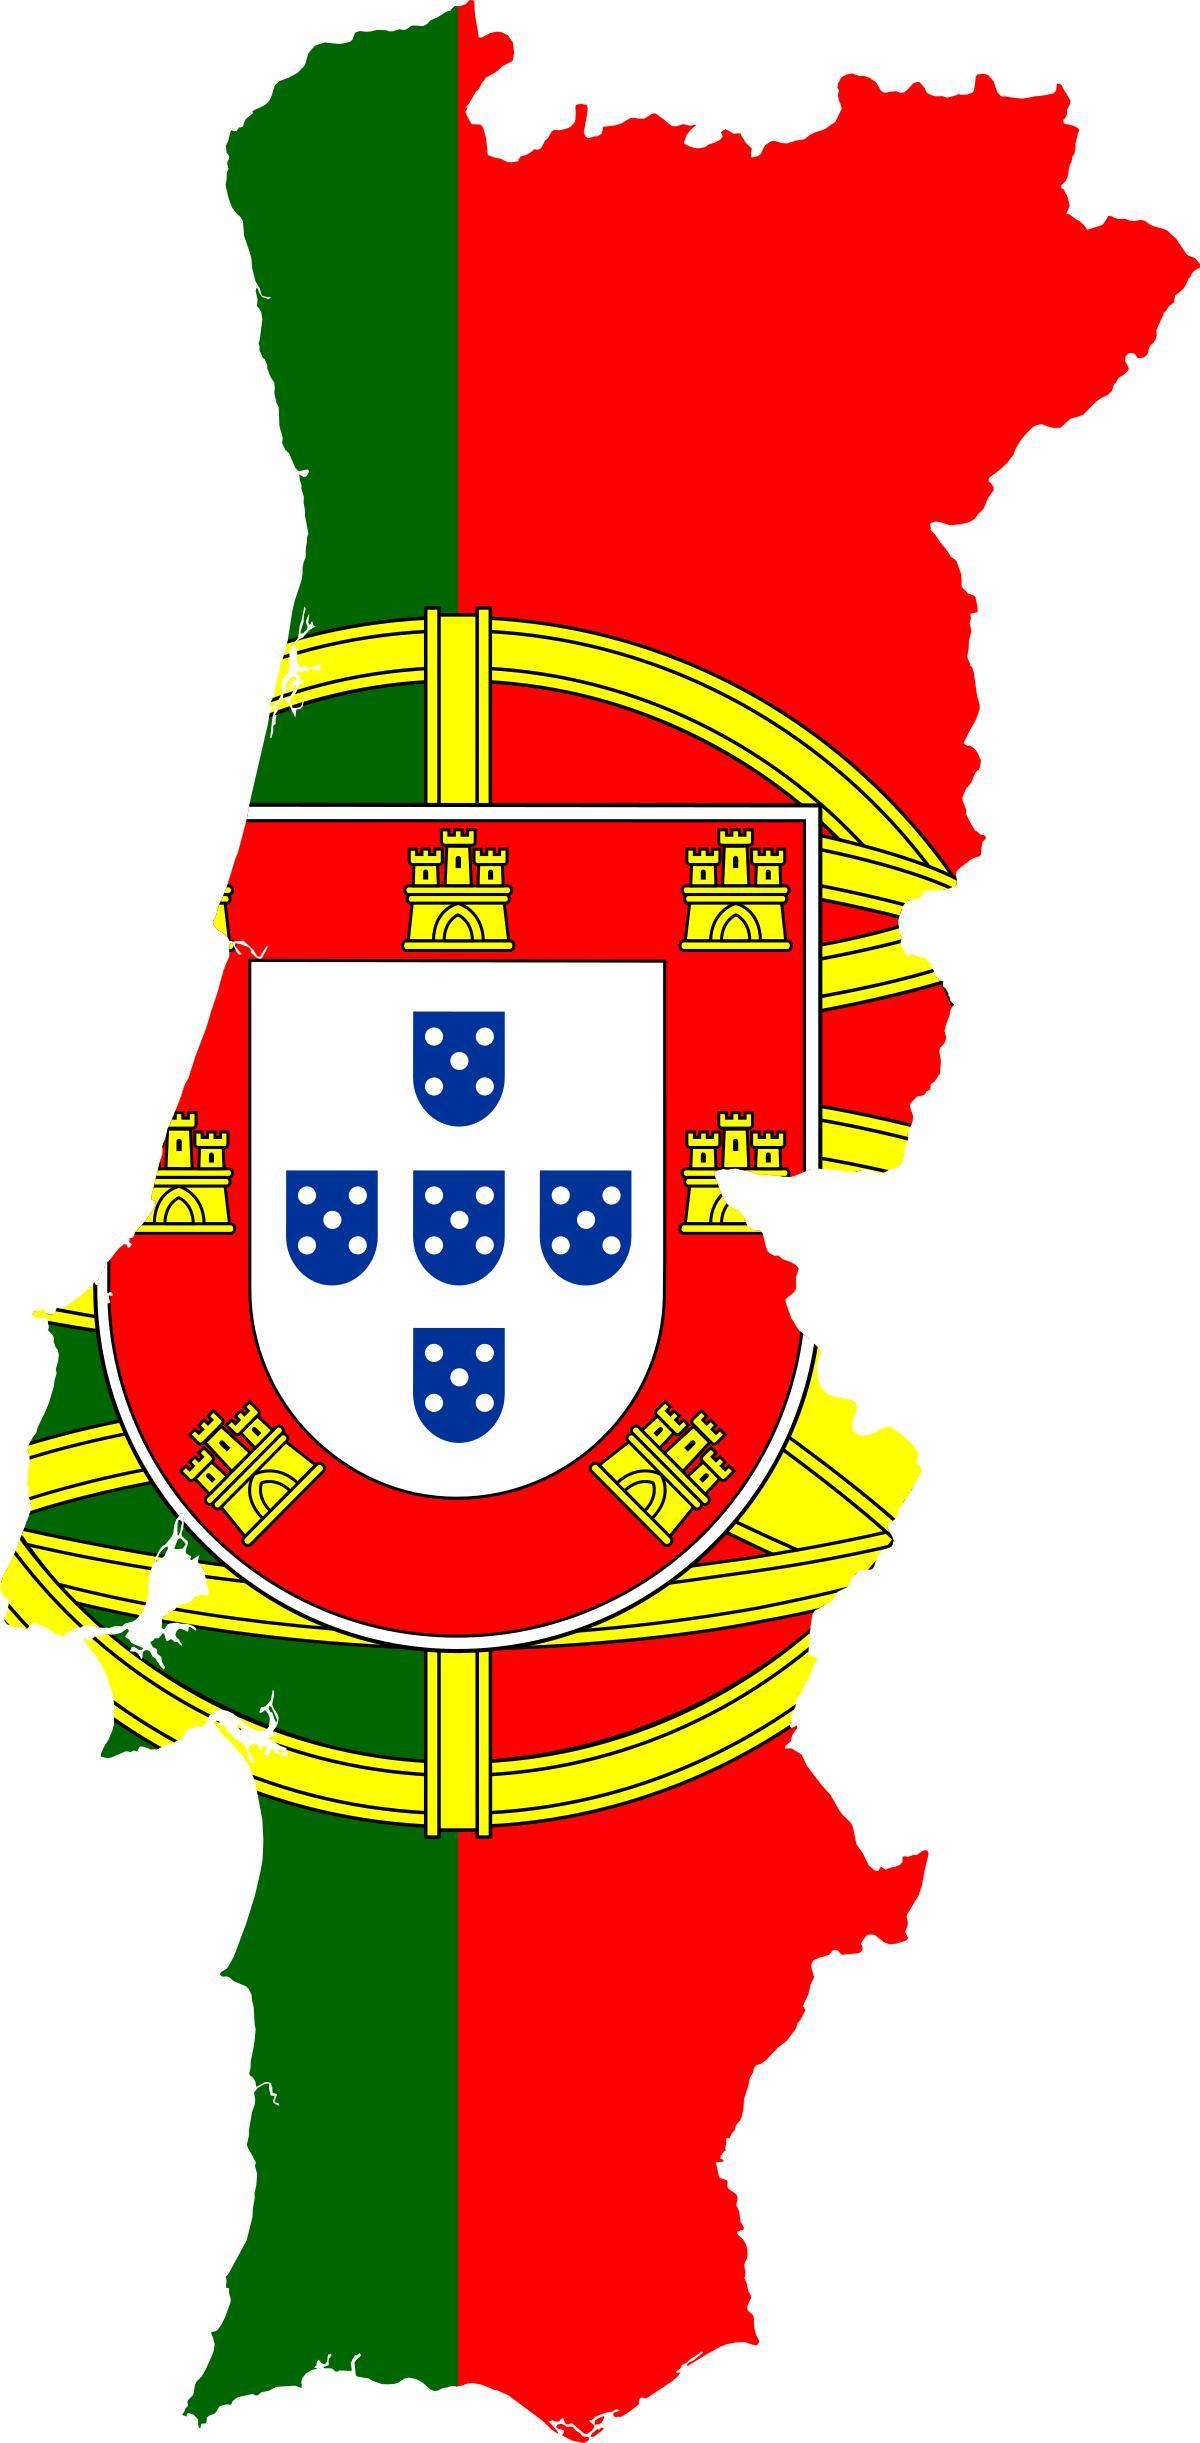 Portugal drapeau carte portugal carte drapeau le sud de - Drapeau portugal imprimer ...